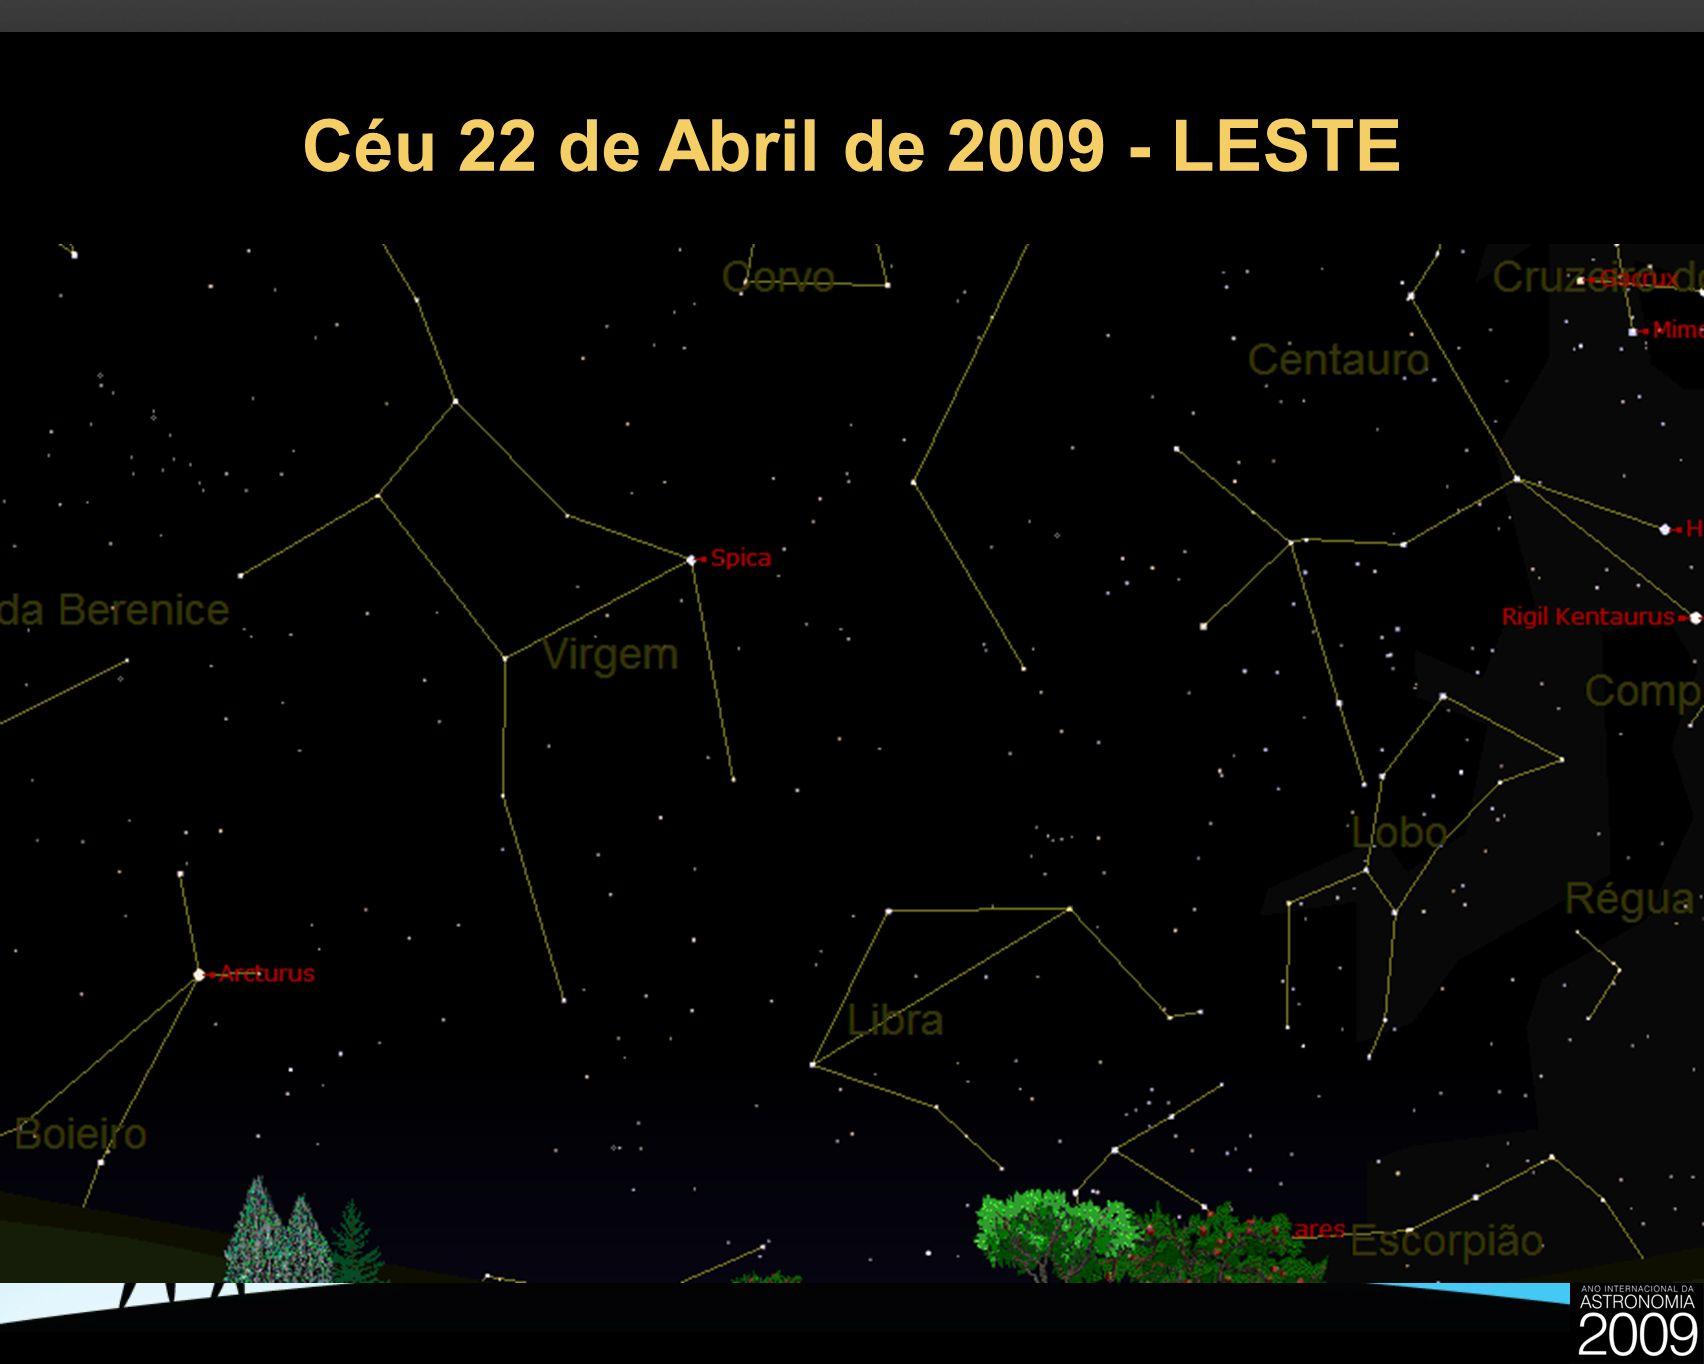 Céu 22 de Abril de 2009 - LESTE 24